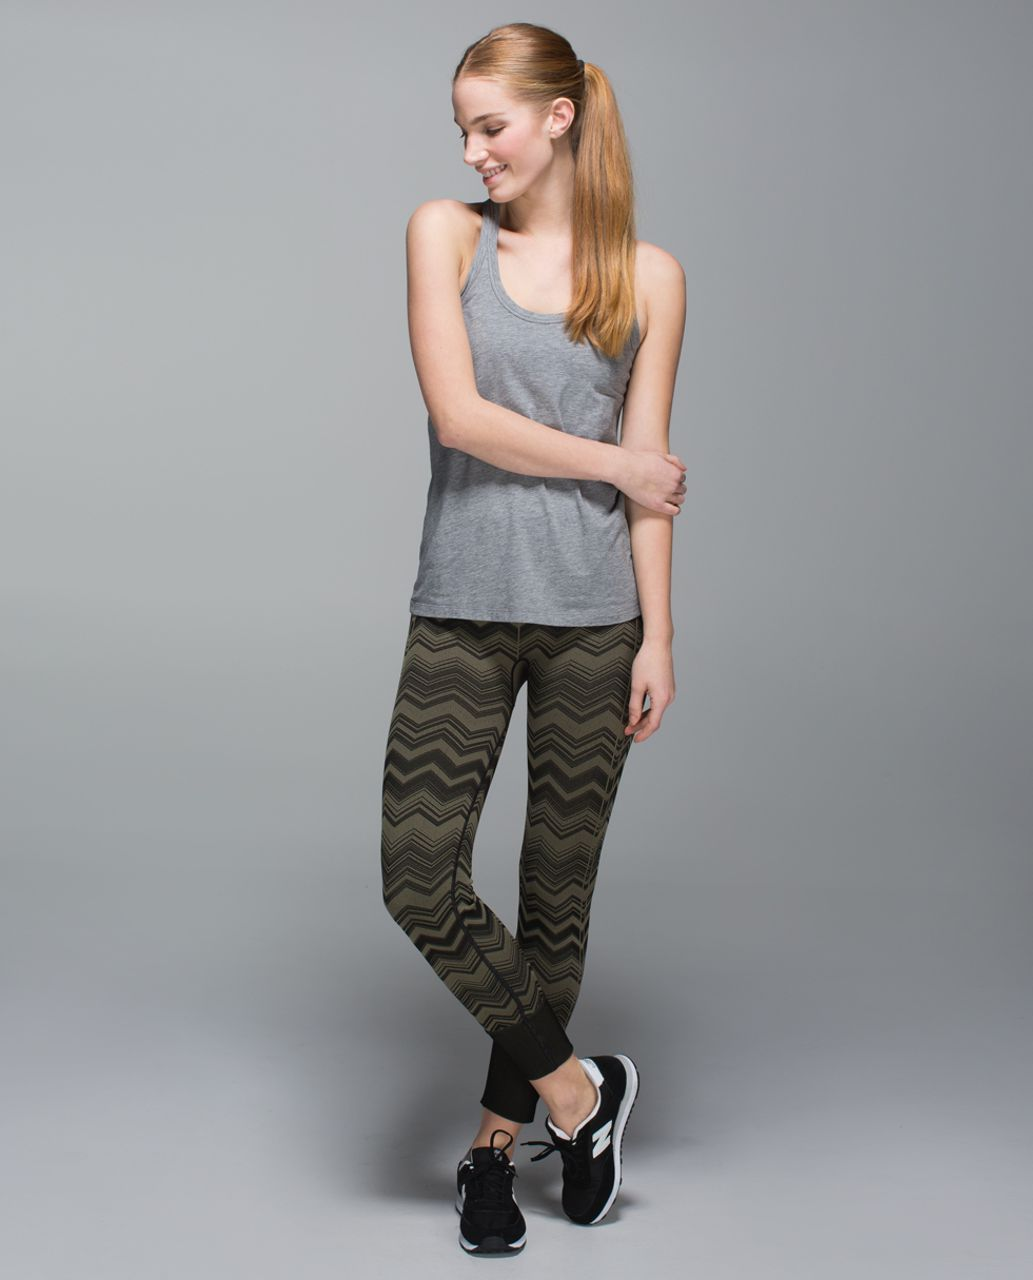 Lululemon Ebb To Street Pant - Heathered Fatigue Green (Chevron)